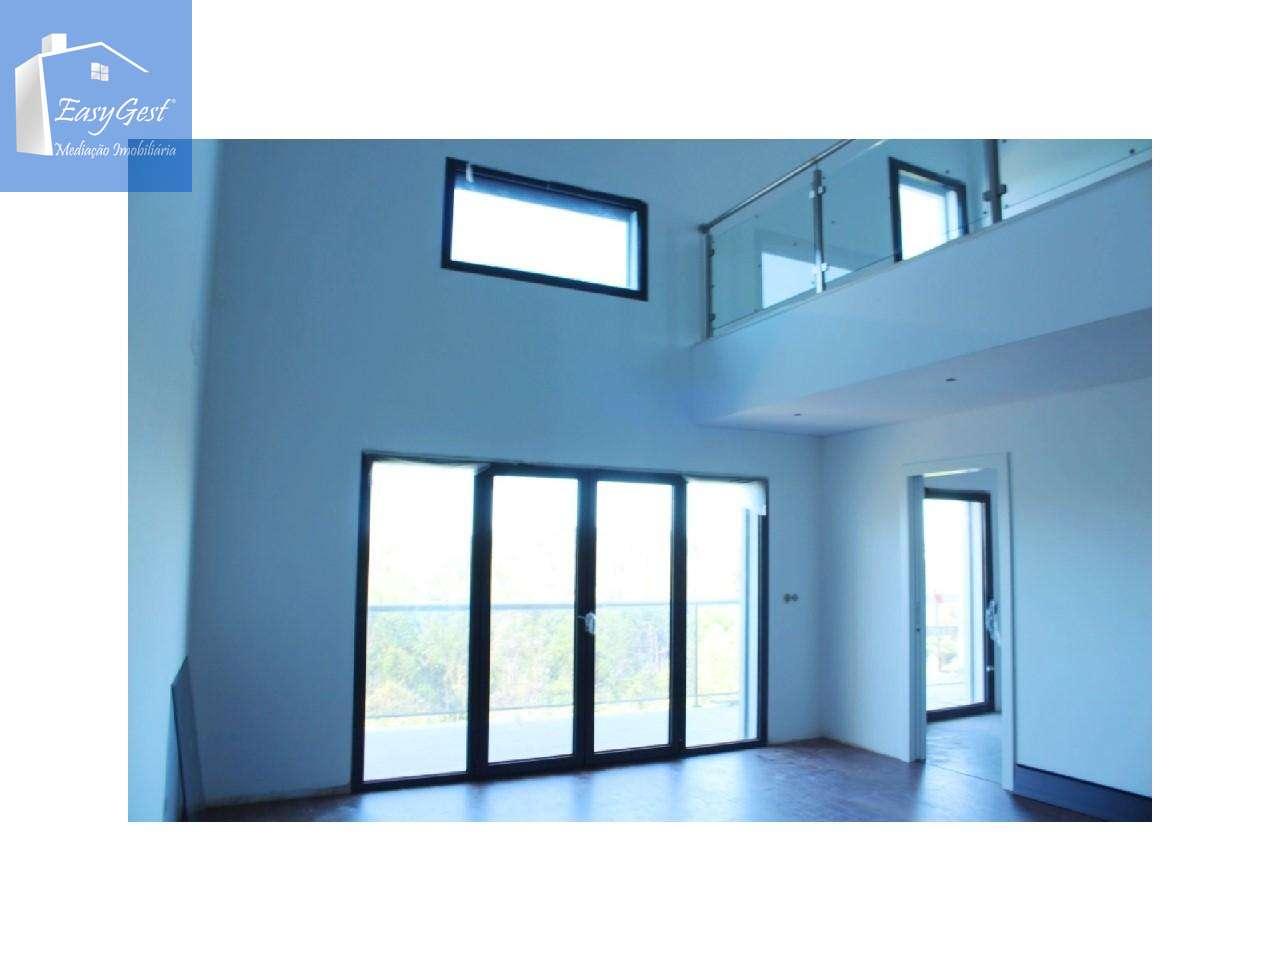 Apartamento para comprar, Corroios, Setúbal - Foto 1